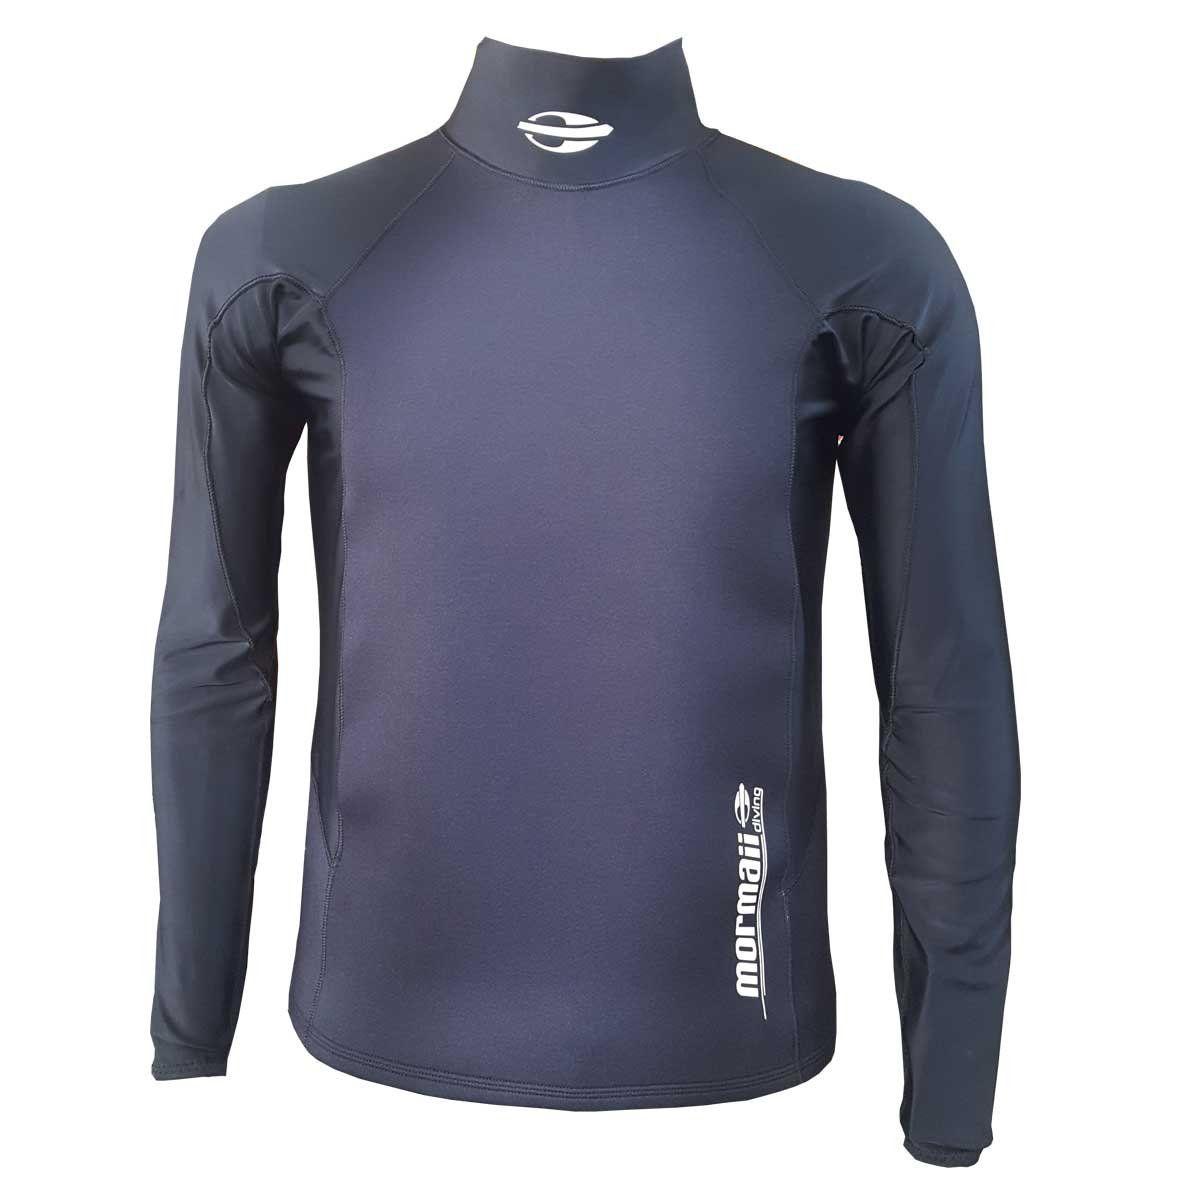 Camisa Manga Longa de Neoprene Diving Suits Mormaii